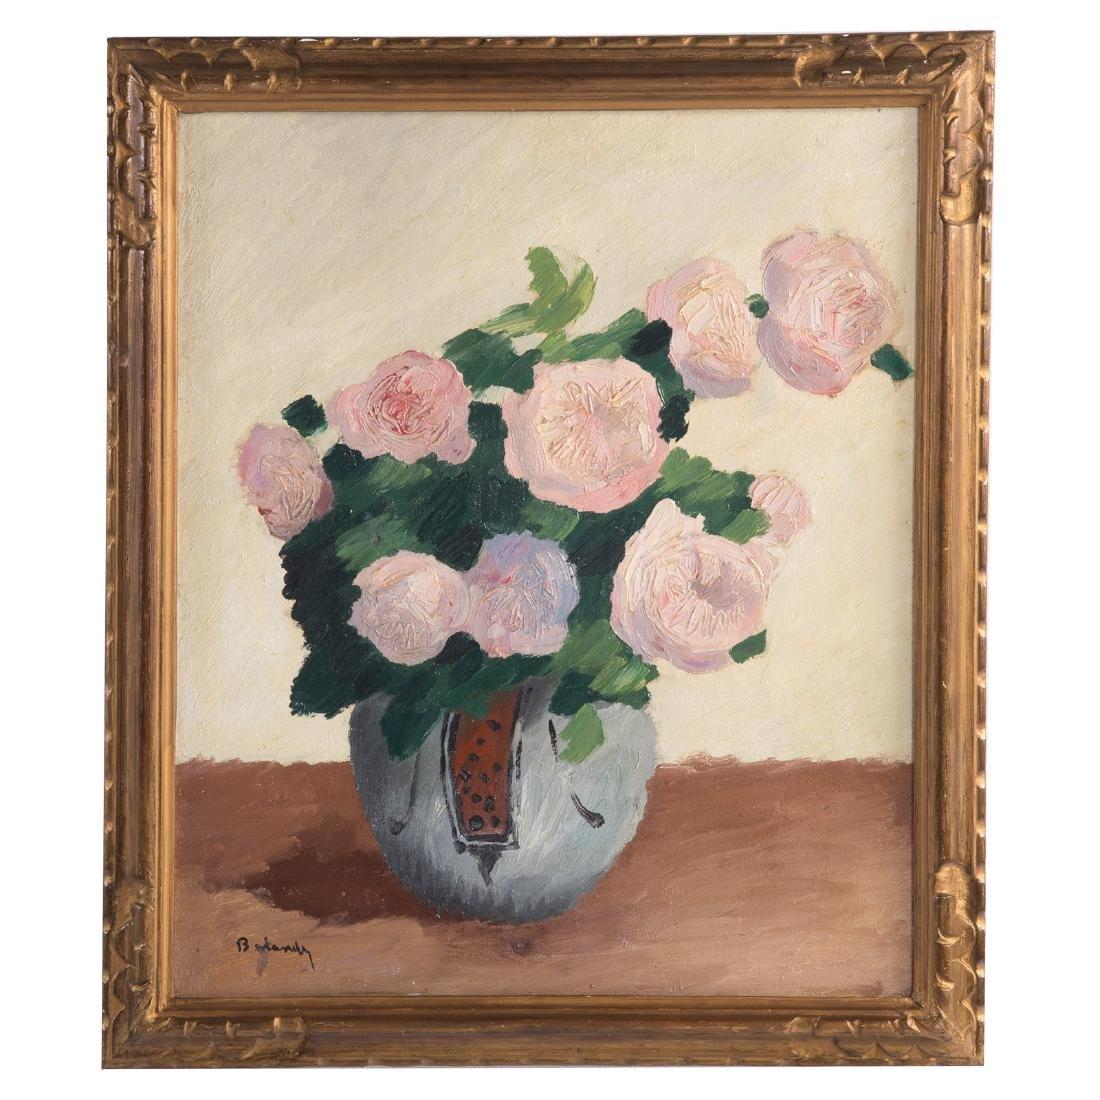 Gaston Balande. Peonies, oil on canvas